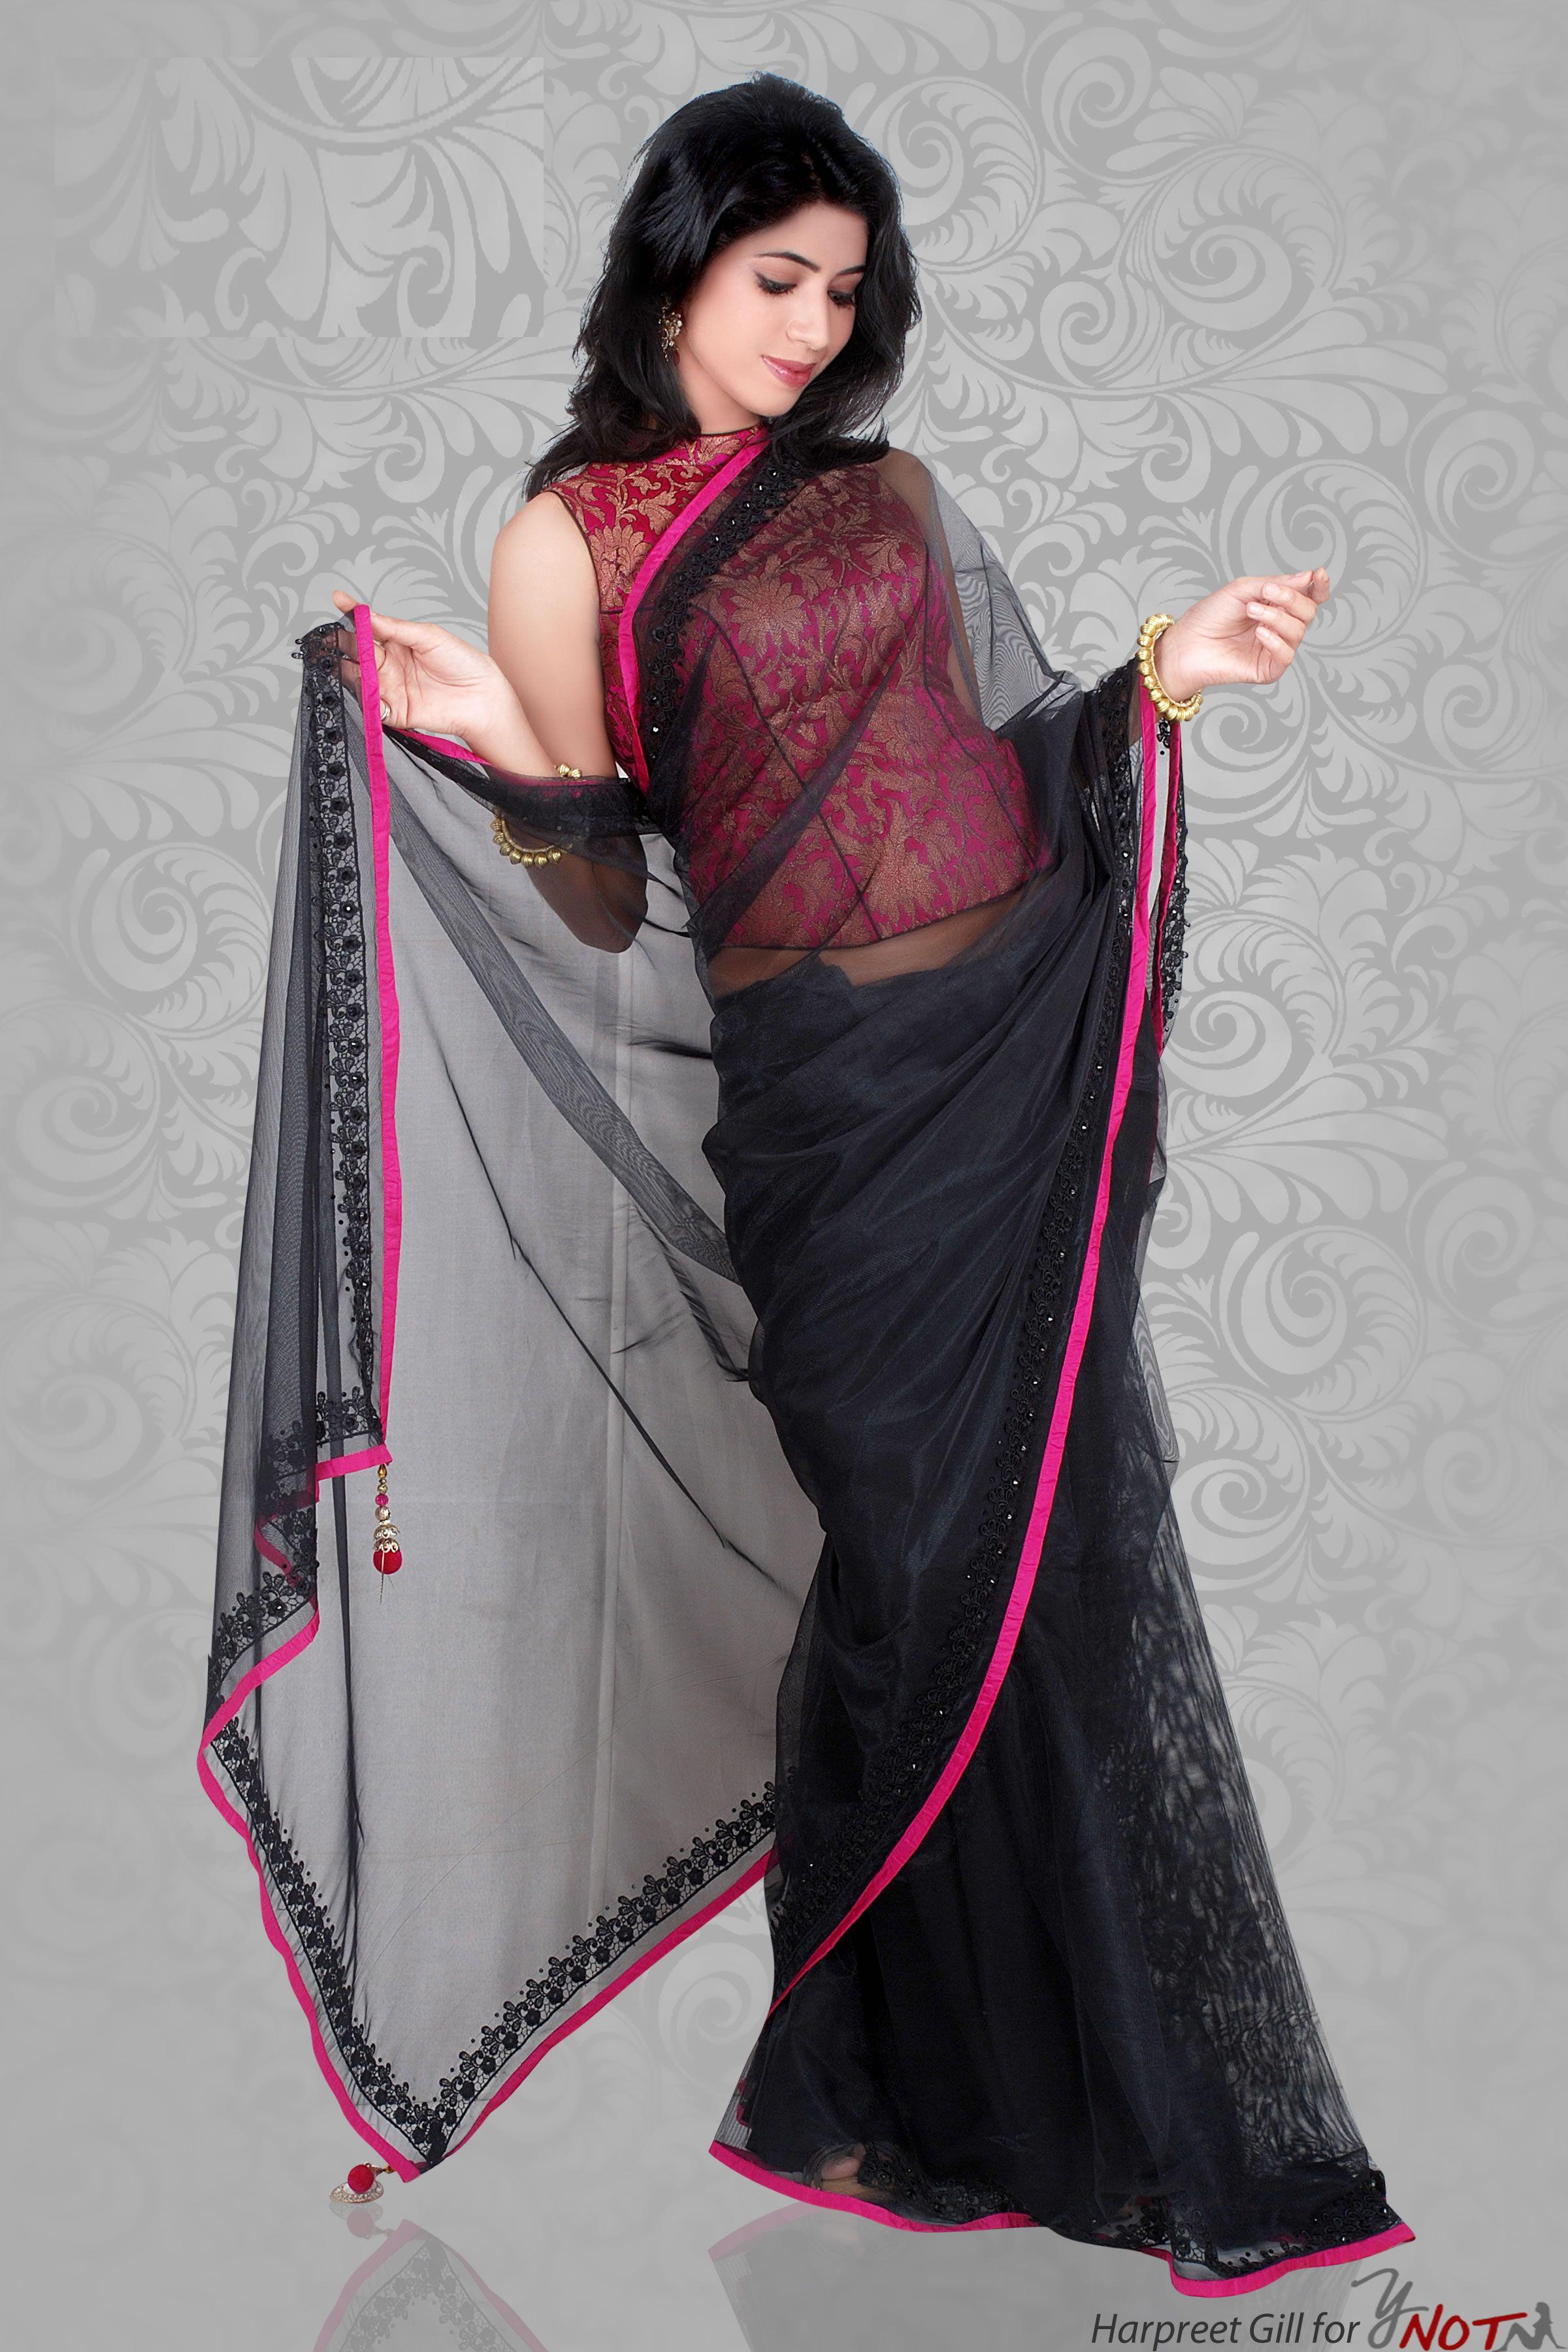 ddab8e64fc1 black-saree-fuschia-pink-brocade-blouse-harpreet | sareeezzzzzzz ...